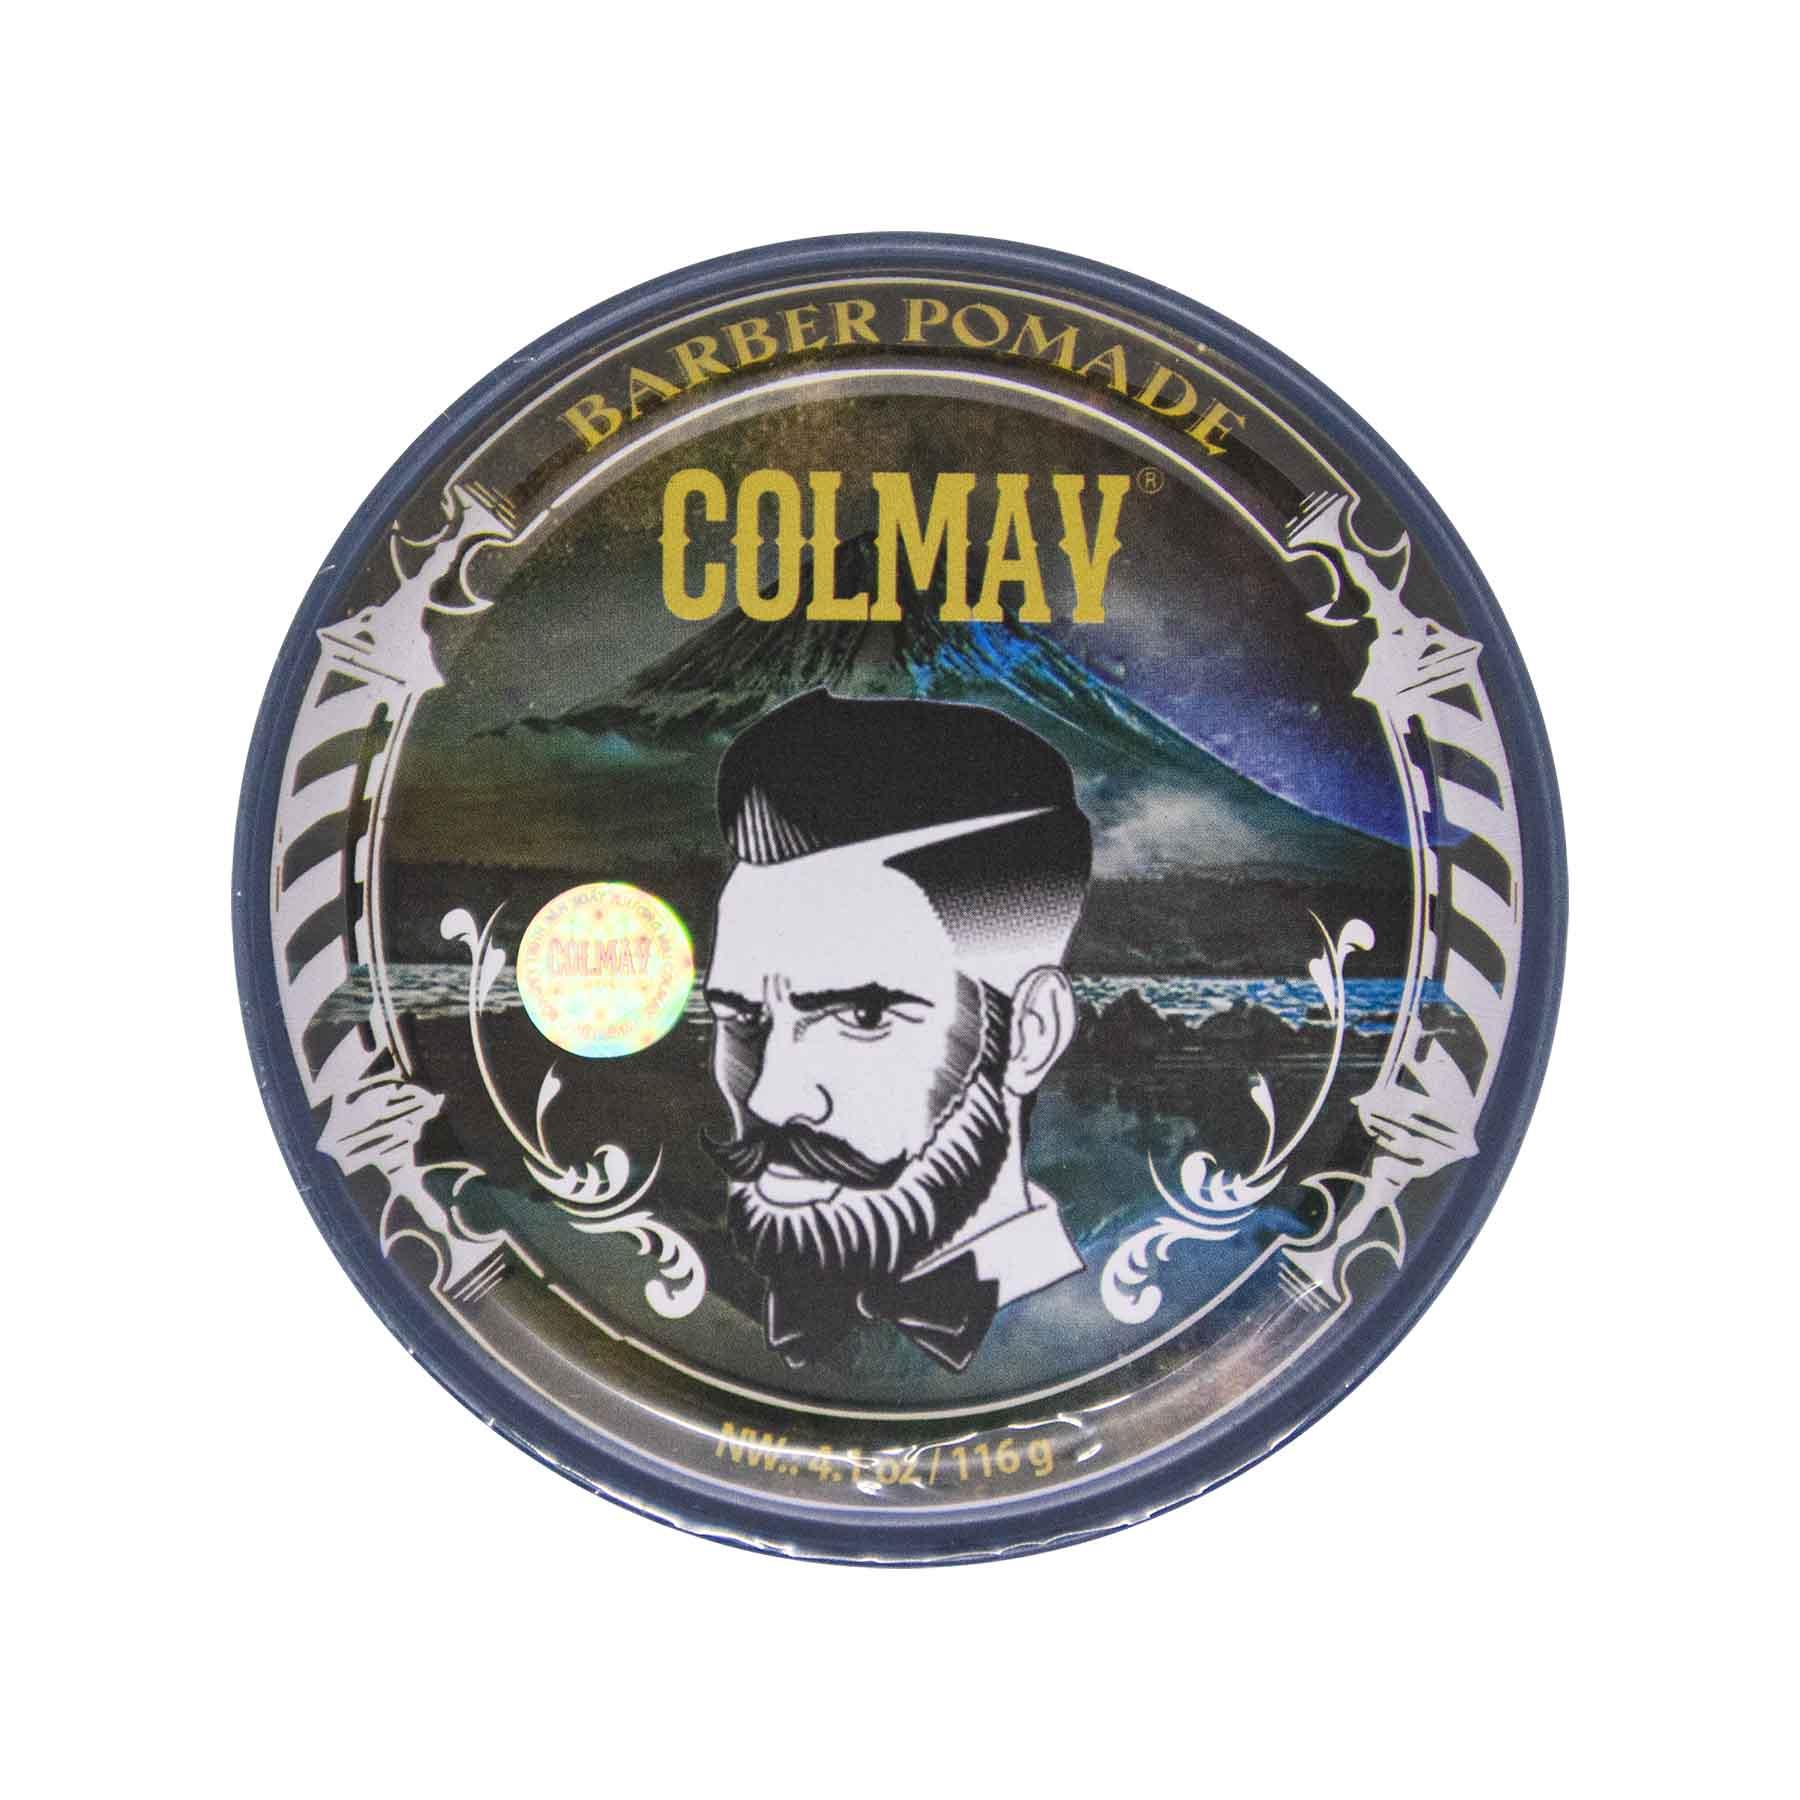 colmav-blue-pomade-01